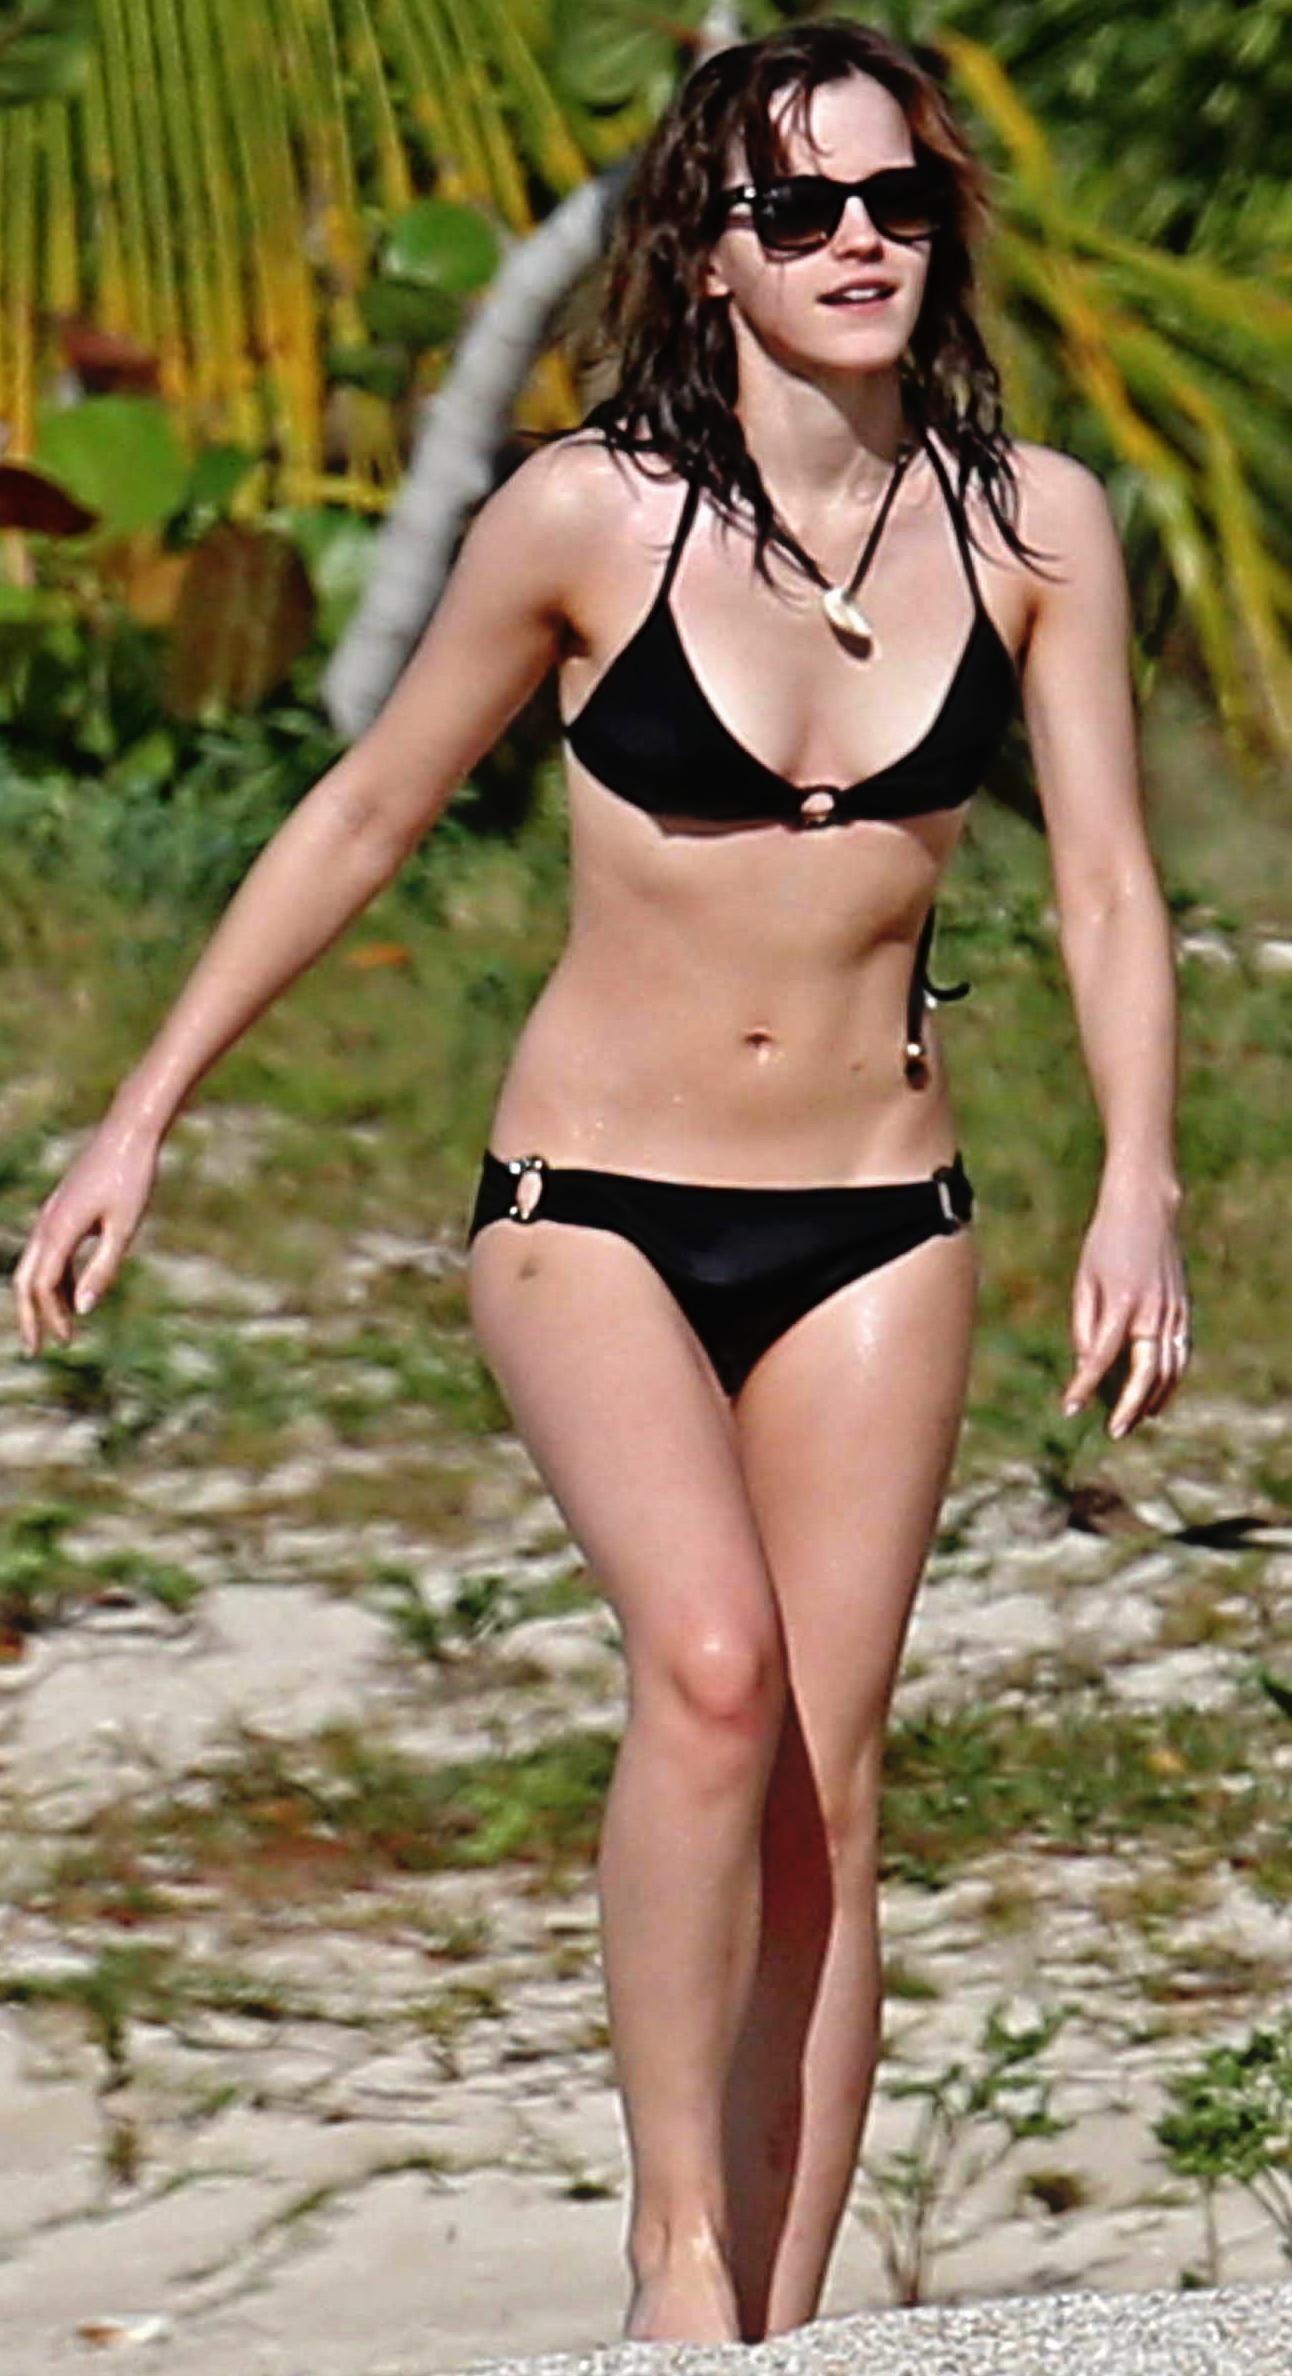 Bikini photo shoots of emma watson